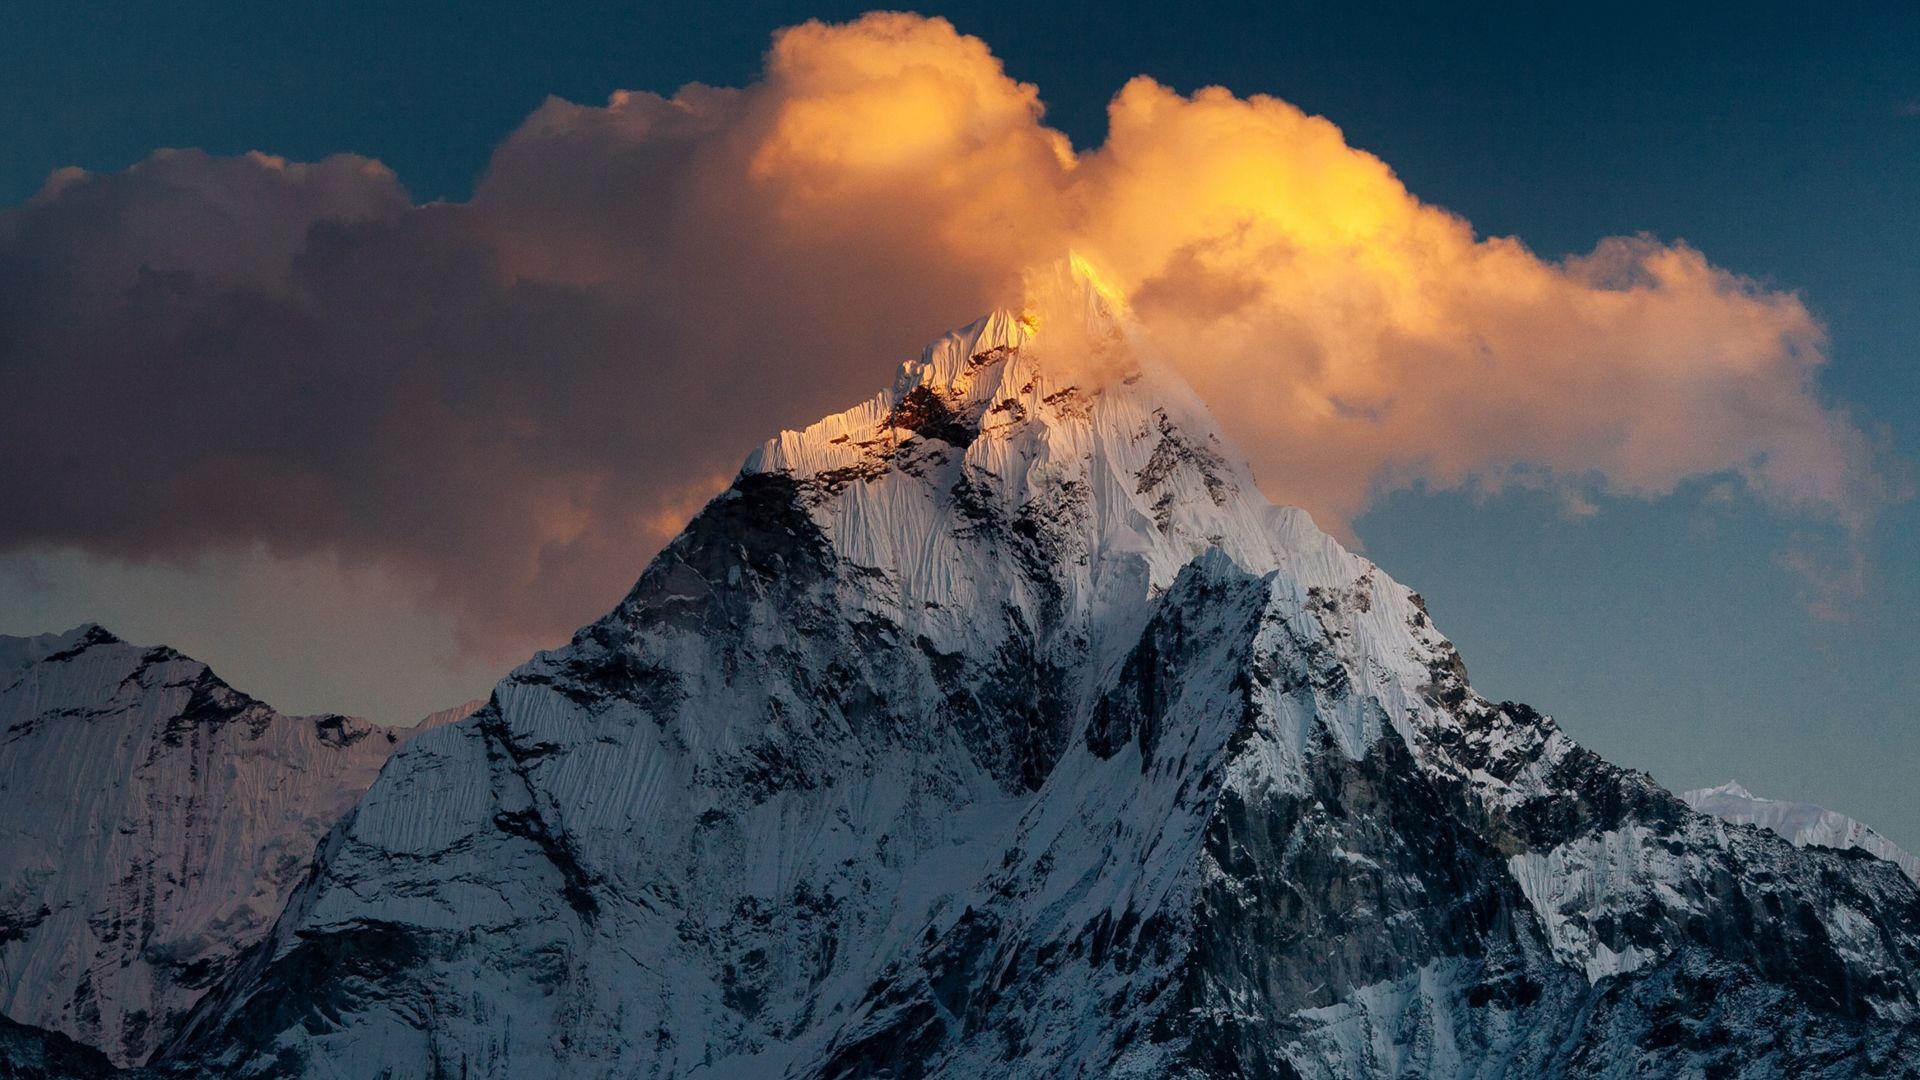 Ama Dablam Mountain Nepal 19201080 Hdwallpaper Wallpaper